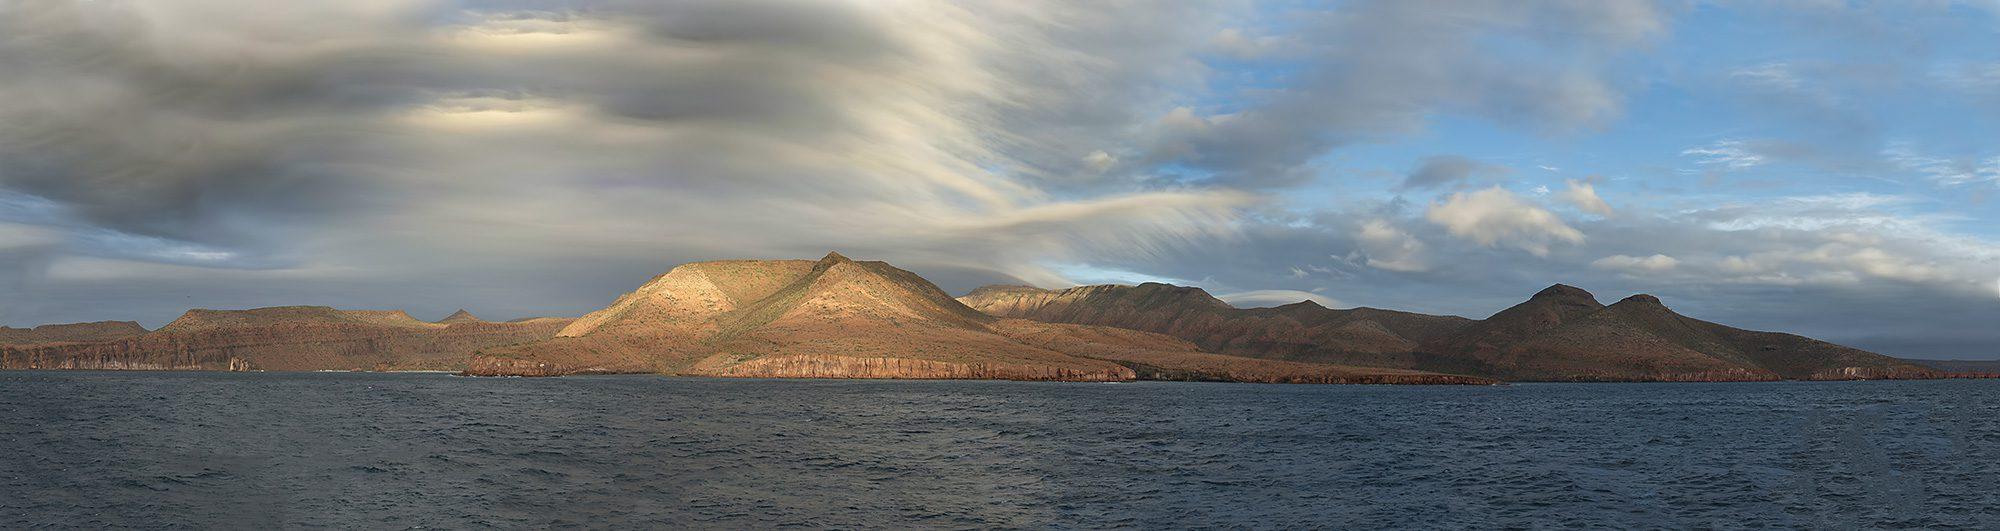 Isla Espiritu Santo, Sea of Cortez, Mexico